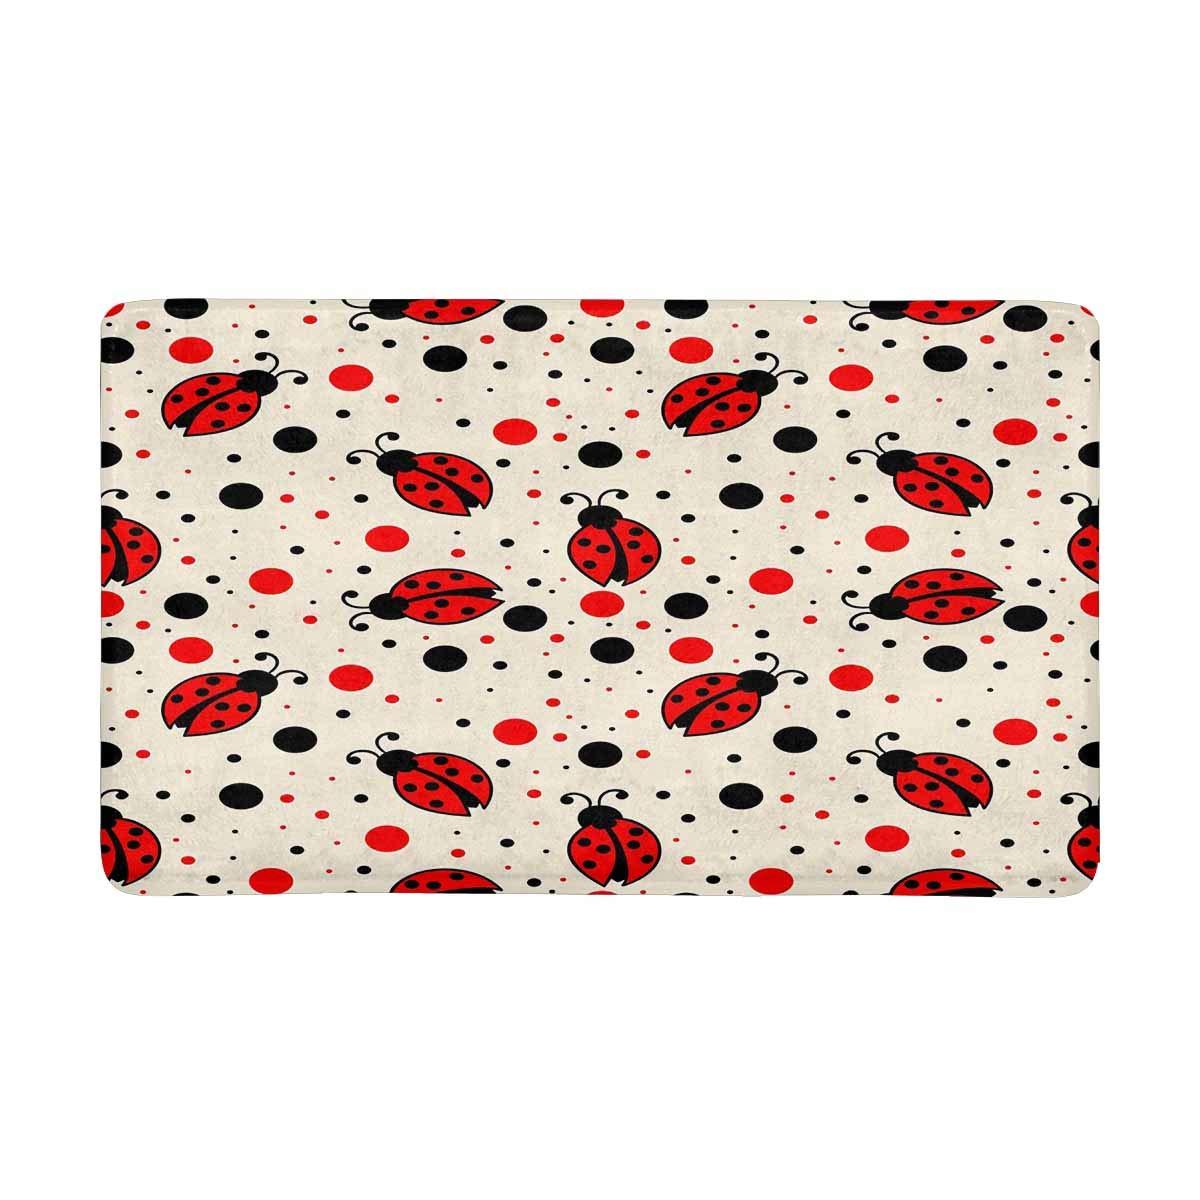 InterestPrint Ladybugs and Dots Indoor Doormat Latex Backing Non Slip Door Mat Entrance Rug 30''(L) x 18''(W)